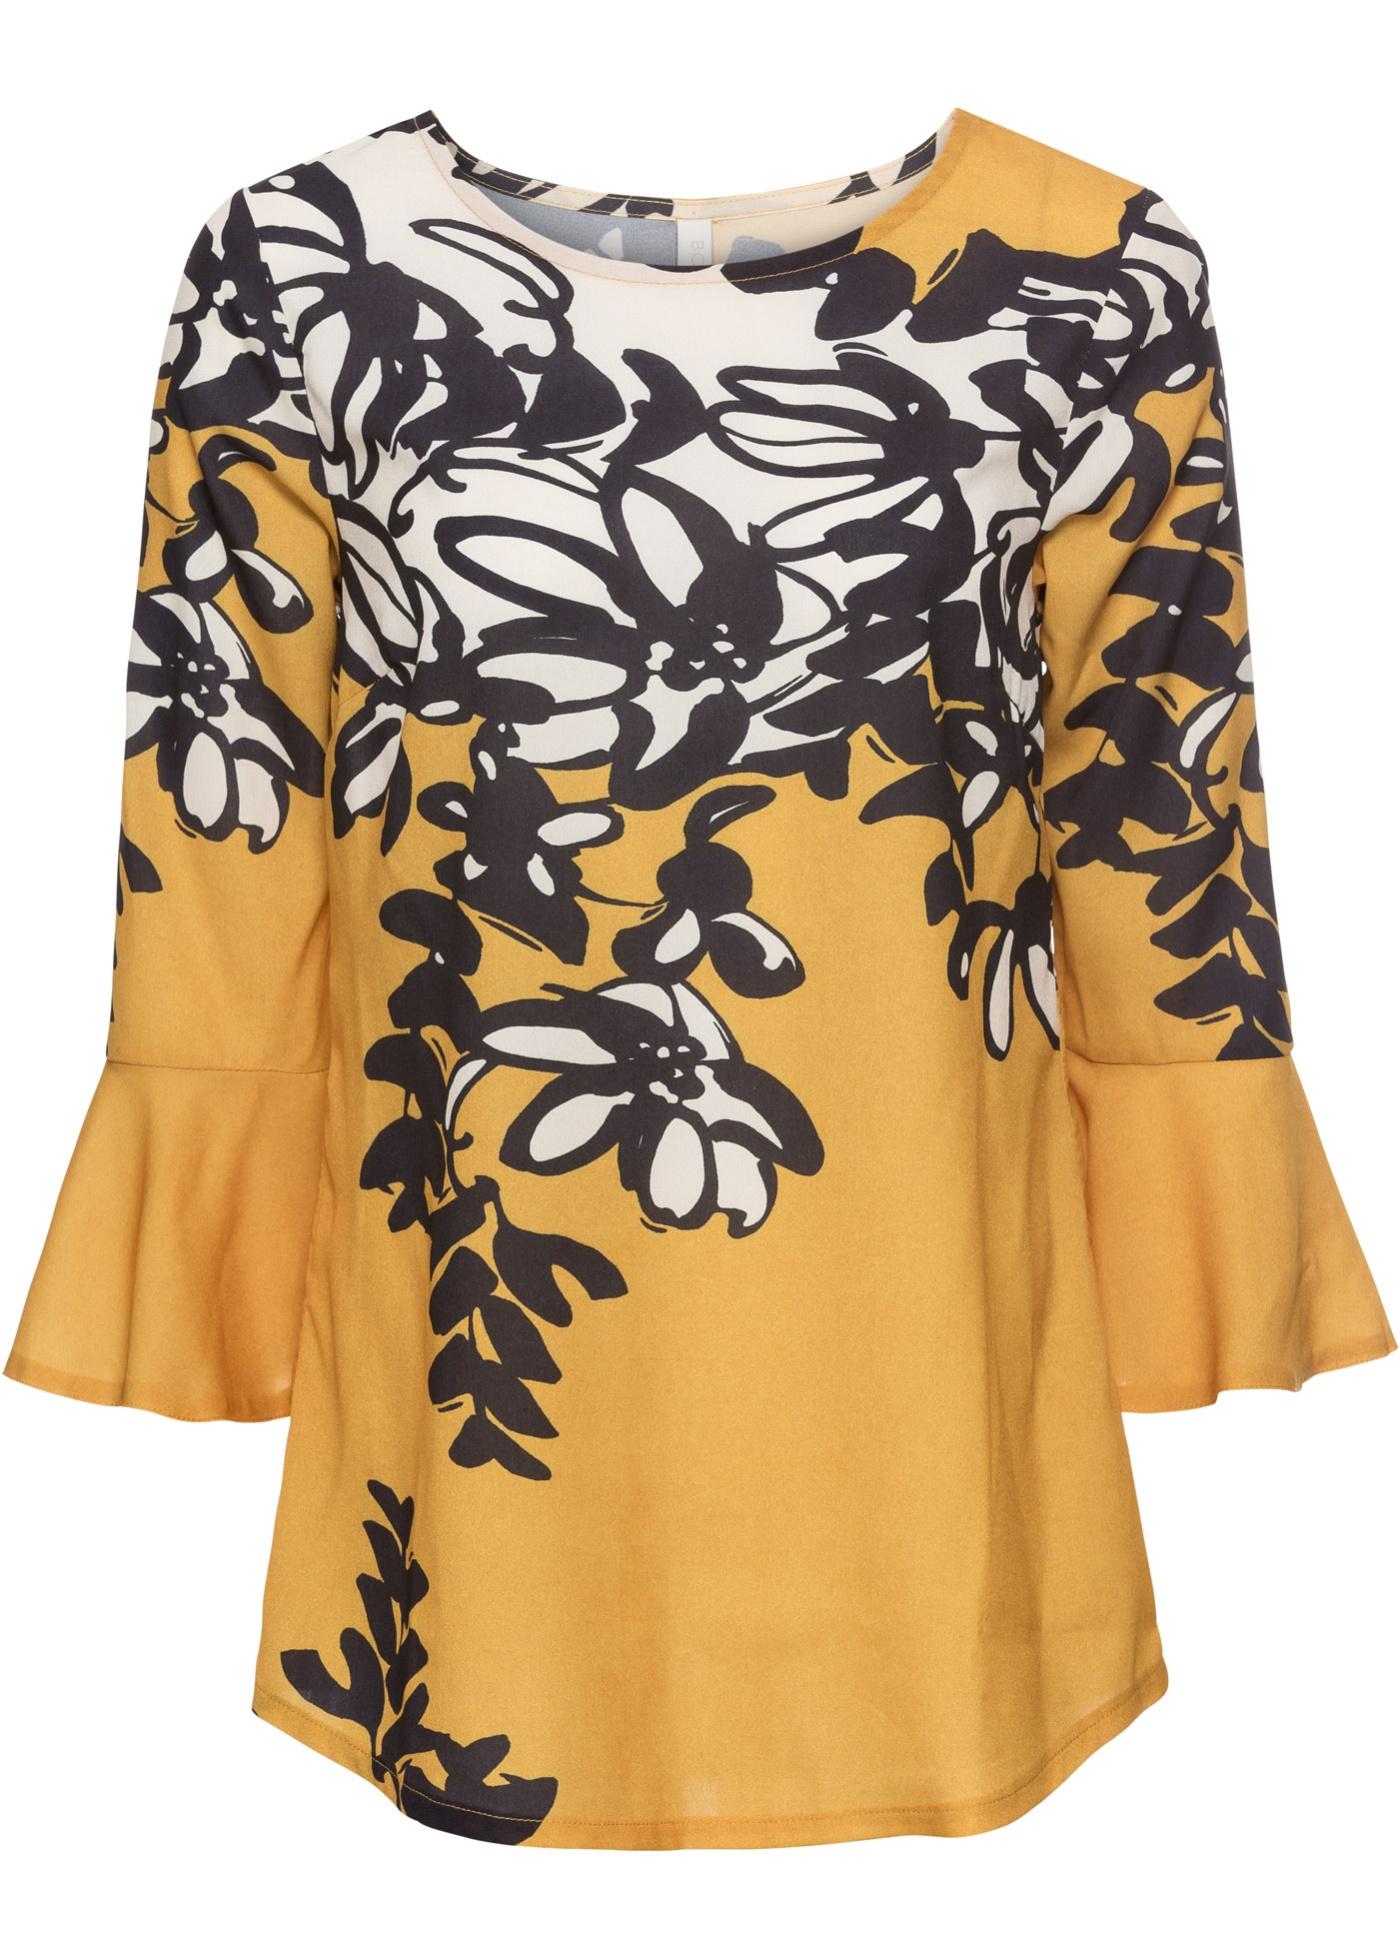 Blusa con stampa floreale (Oro) - BODYFLIRT boutique